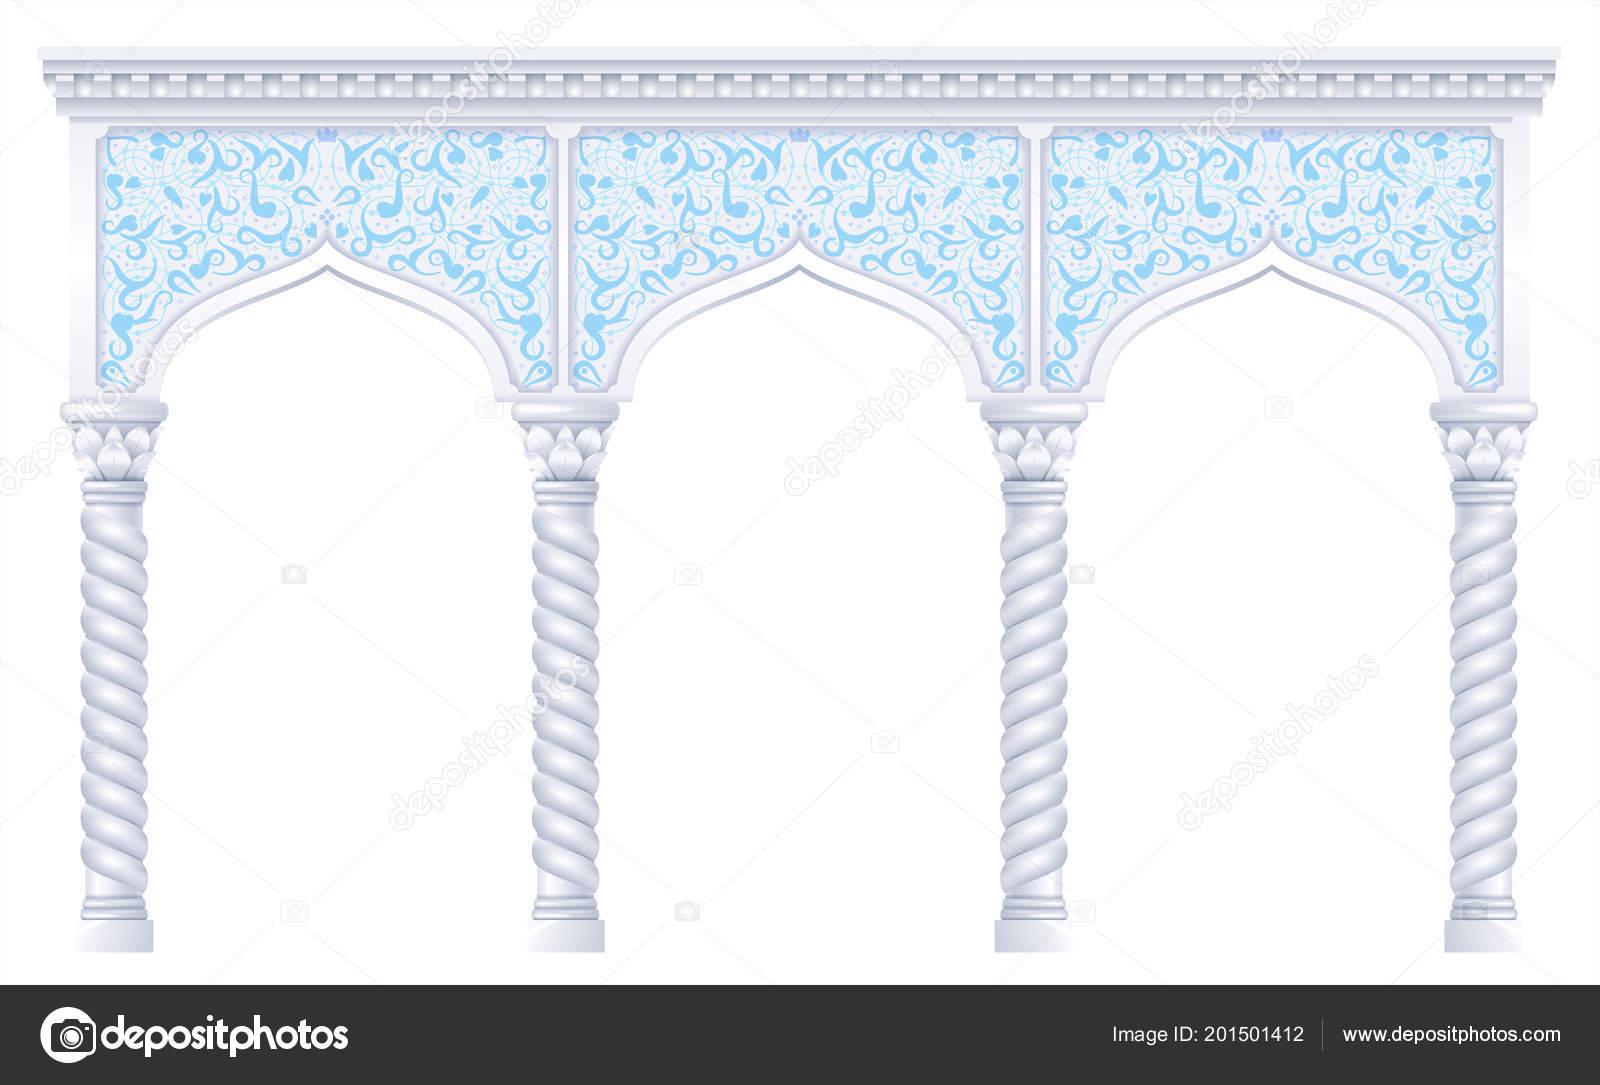 fairytale oriental indian arabian arch background cover invitation